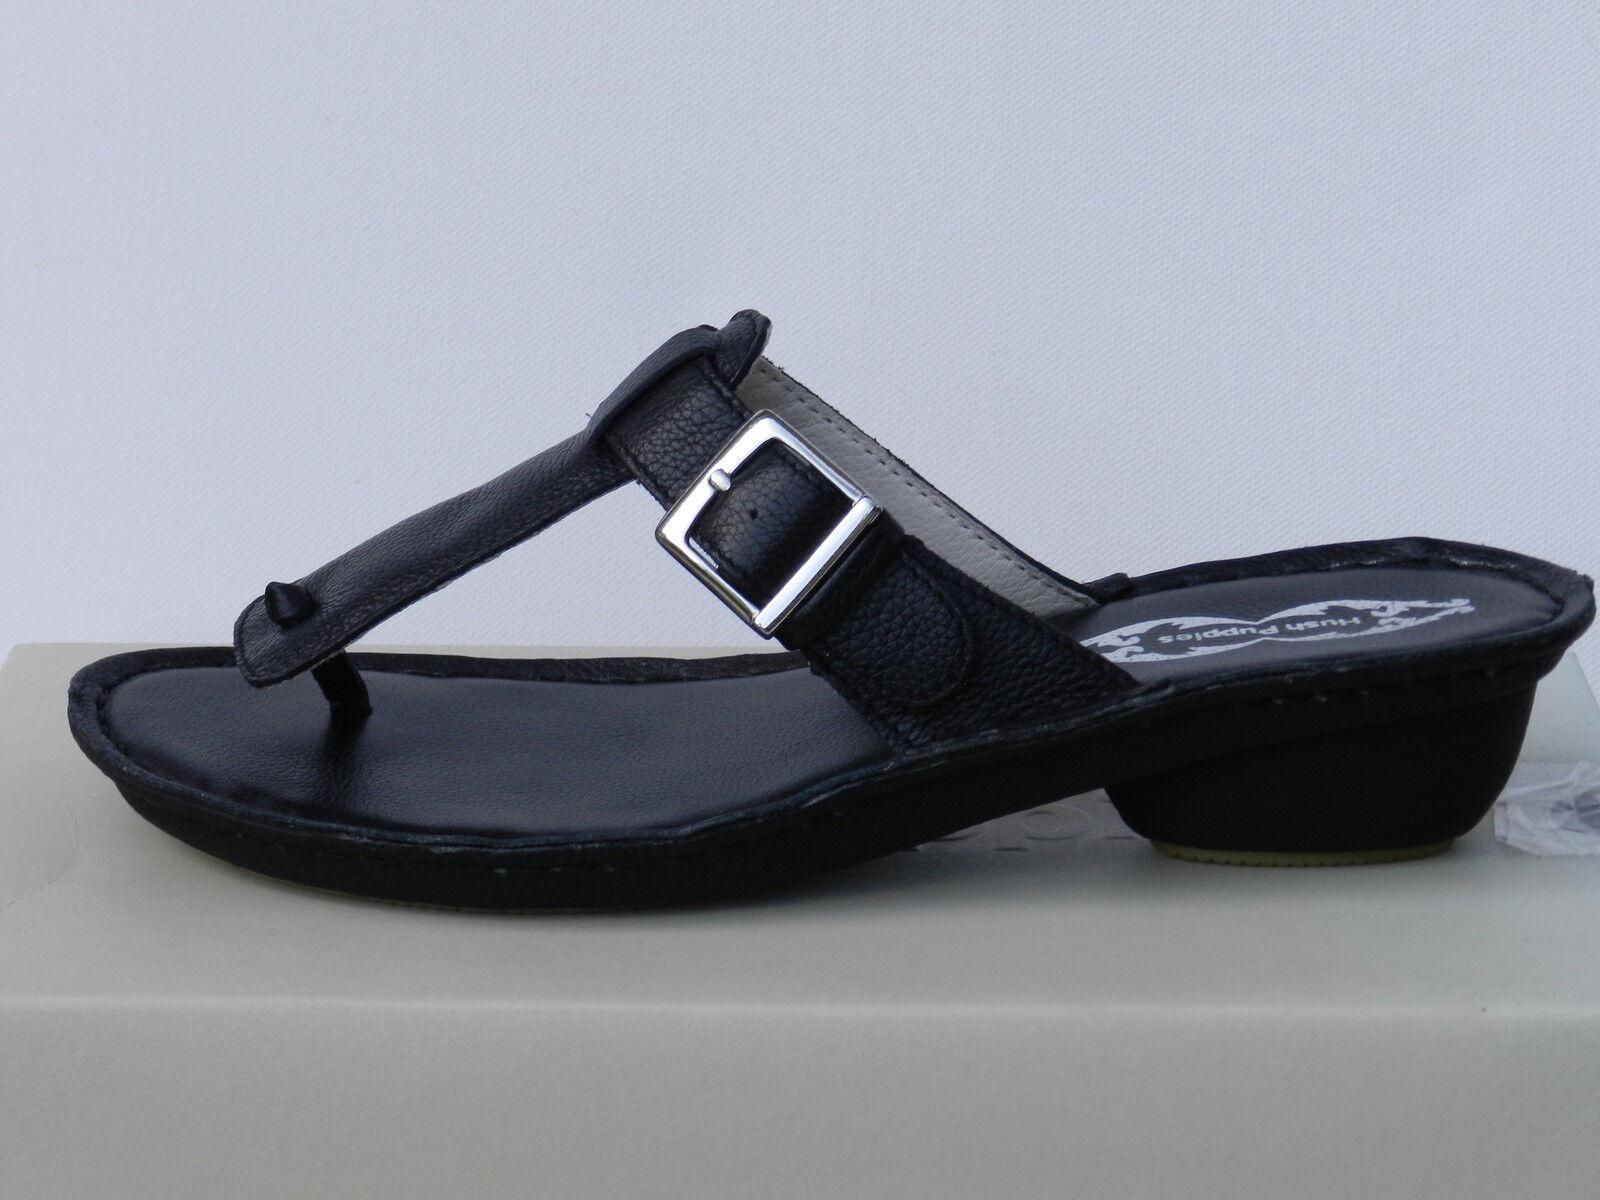 Hush puppies Araxa womens 41 sandals nude feet toe post flip flops uk7 new